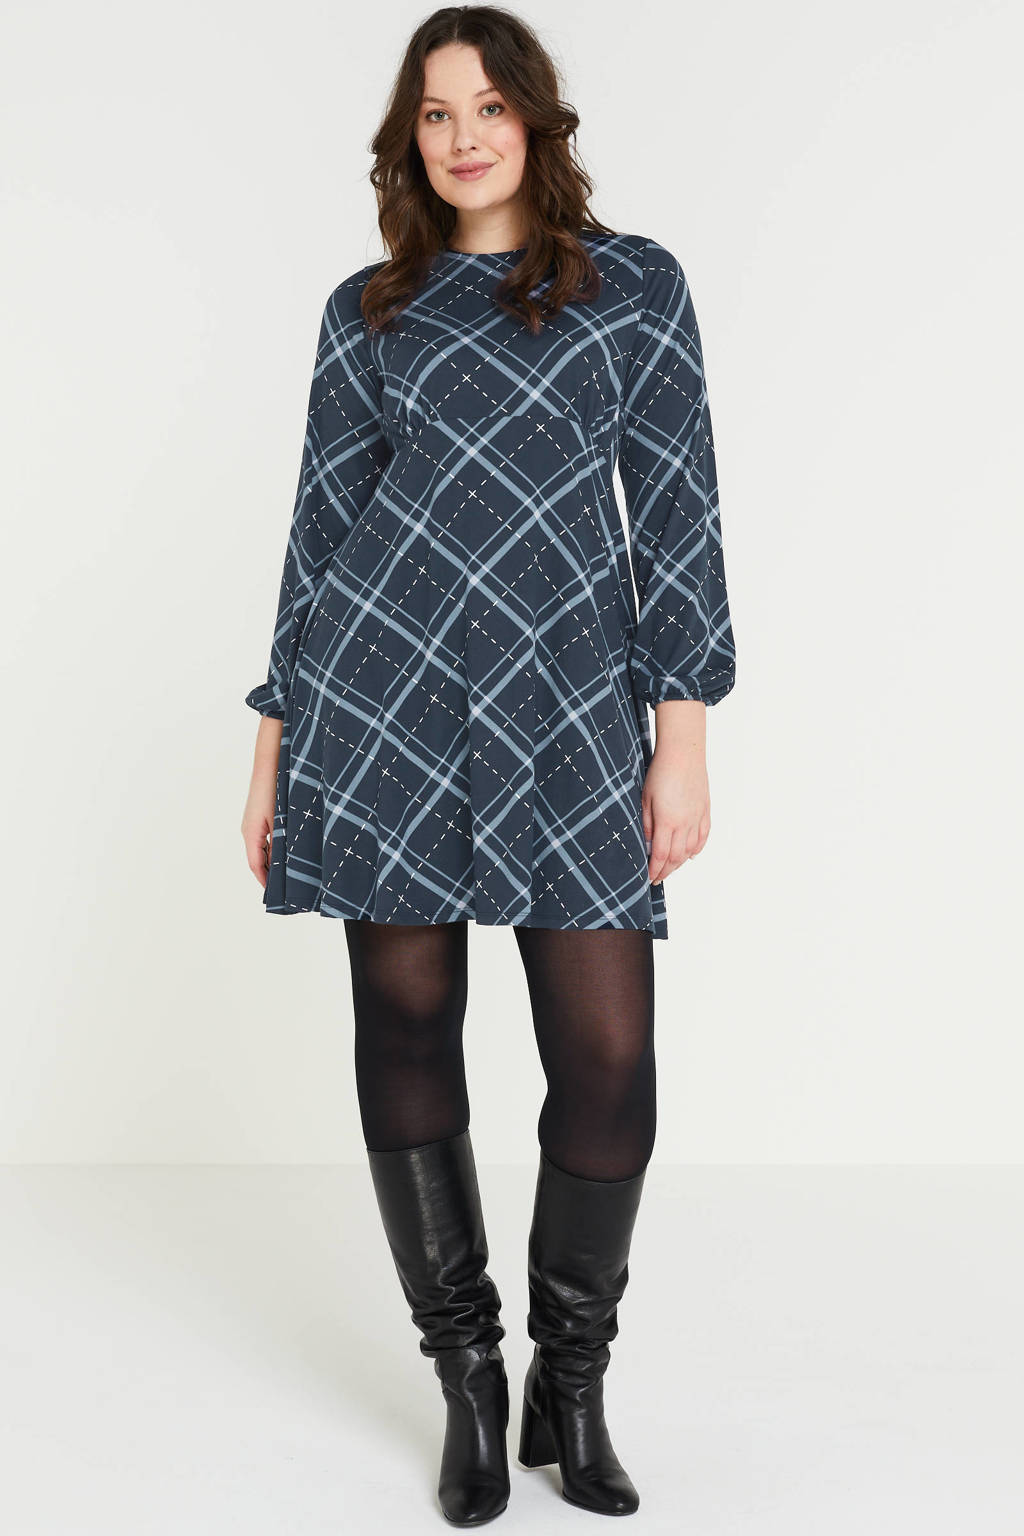 Simply Be A-lijn jurk met all over print en plooien donkerblauw/lichtblauw/wit, Donkerblauw/lichtblauw/wit